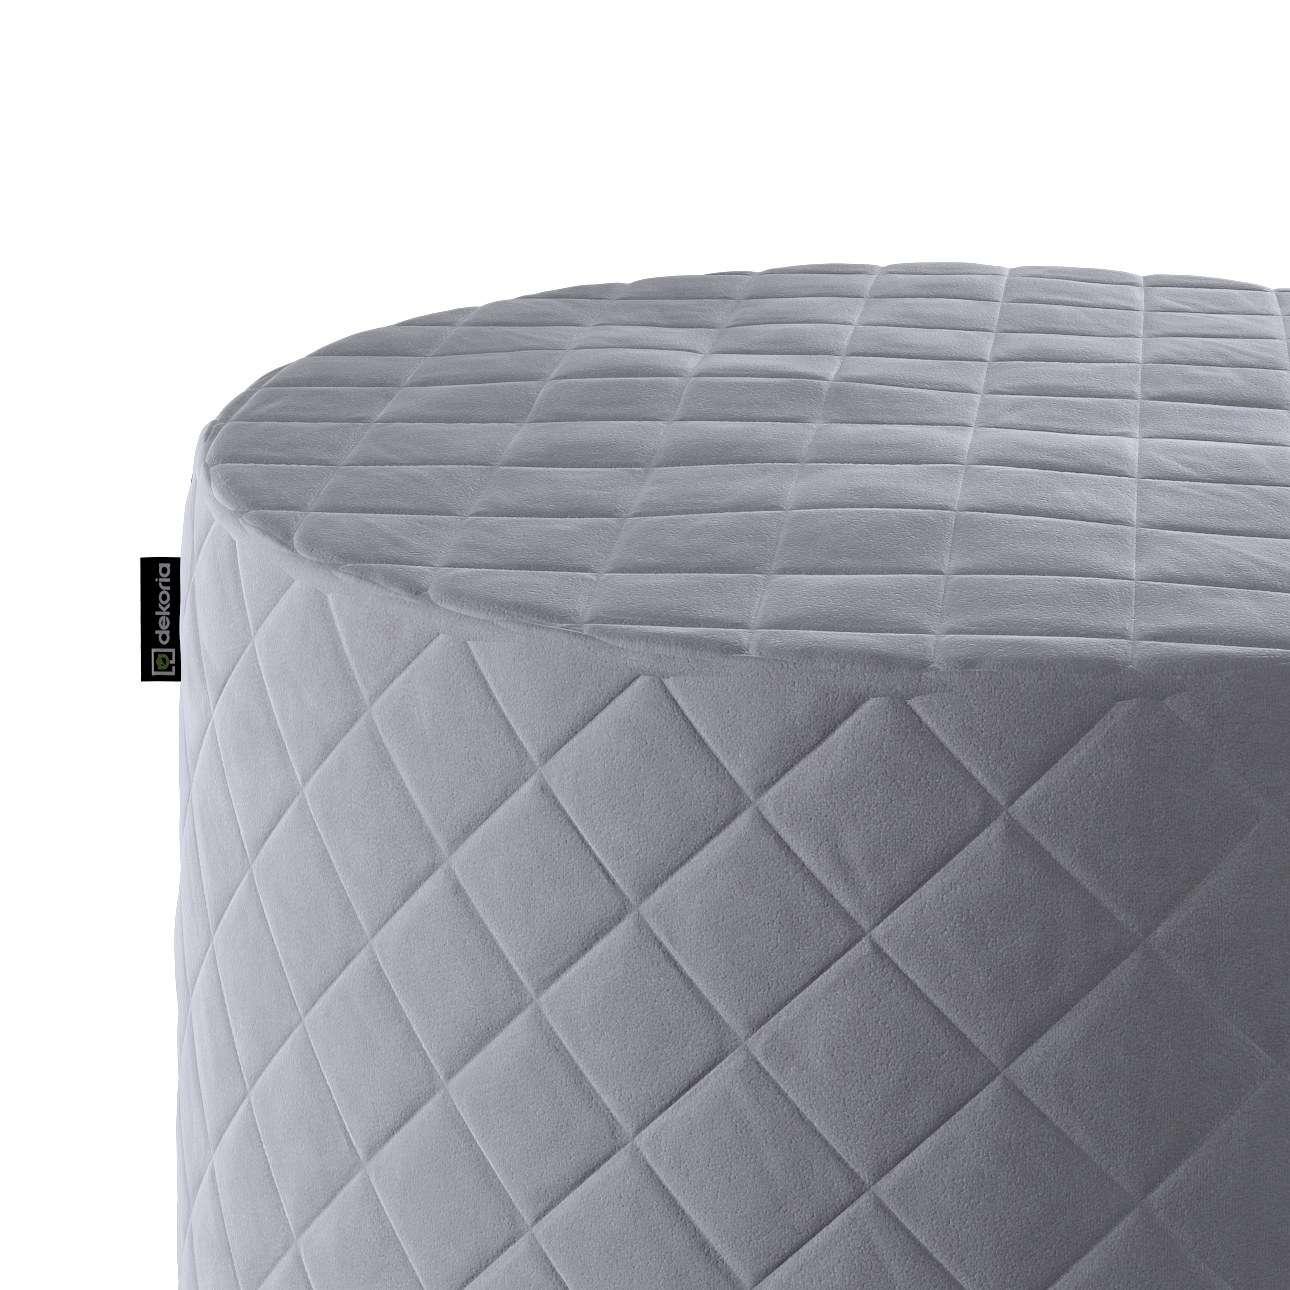 Puf Barrel pikowany w kolekcji Velvet, tkanina: 704-24